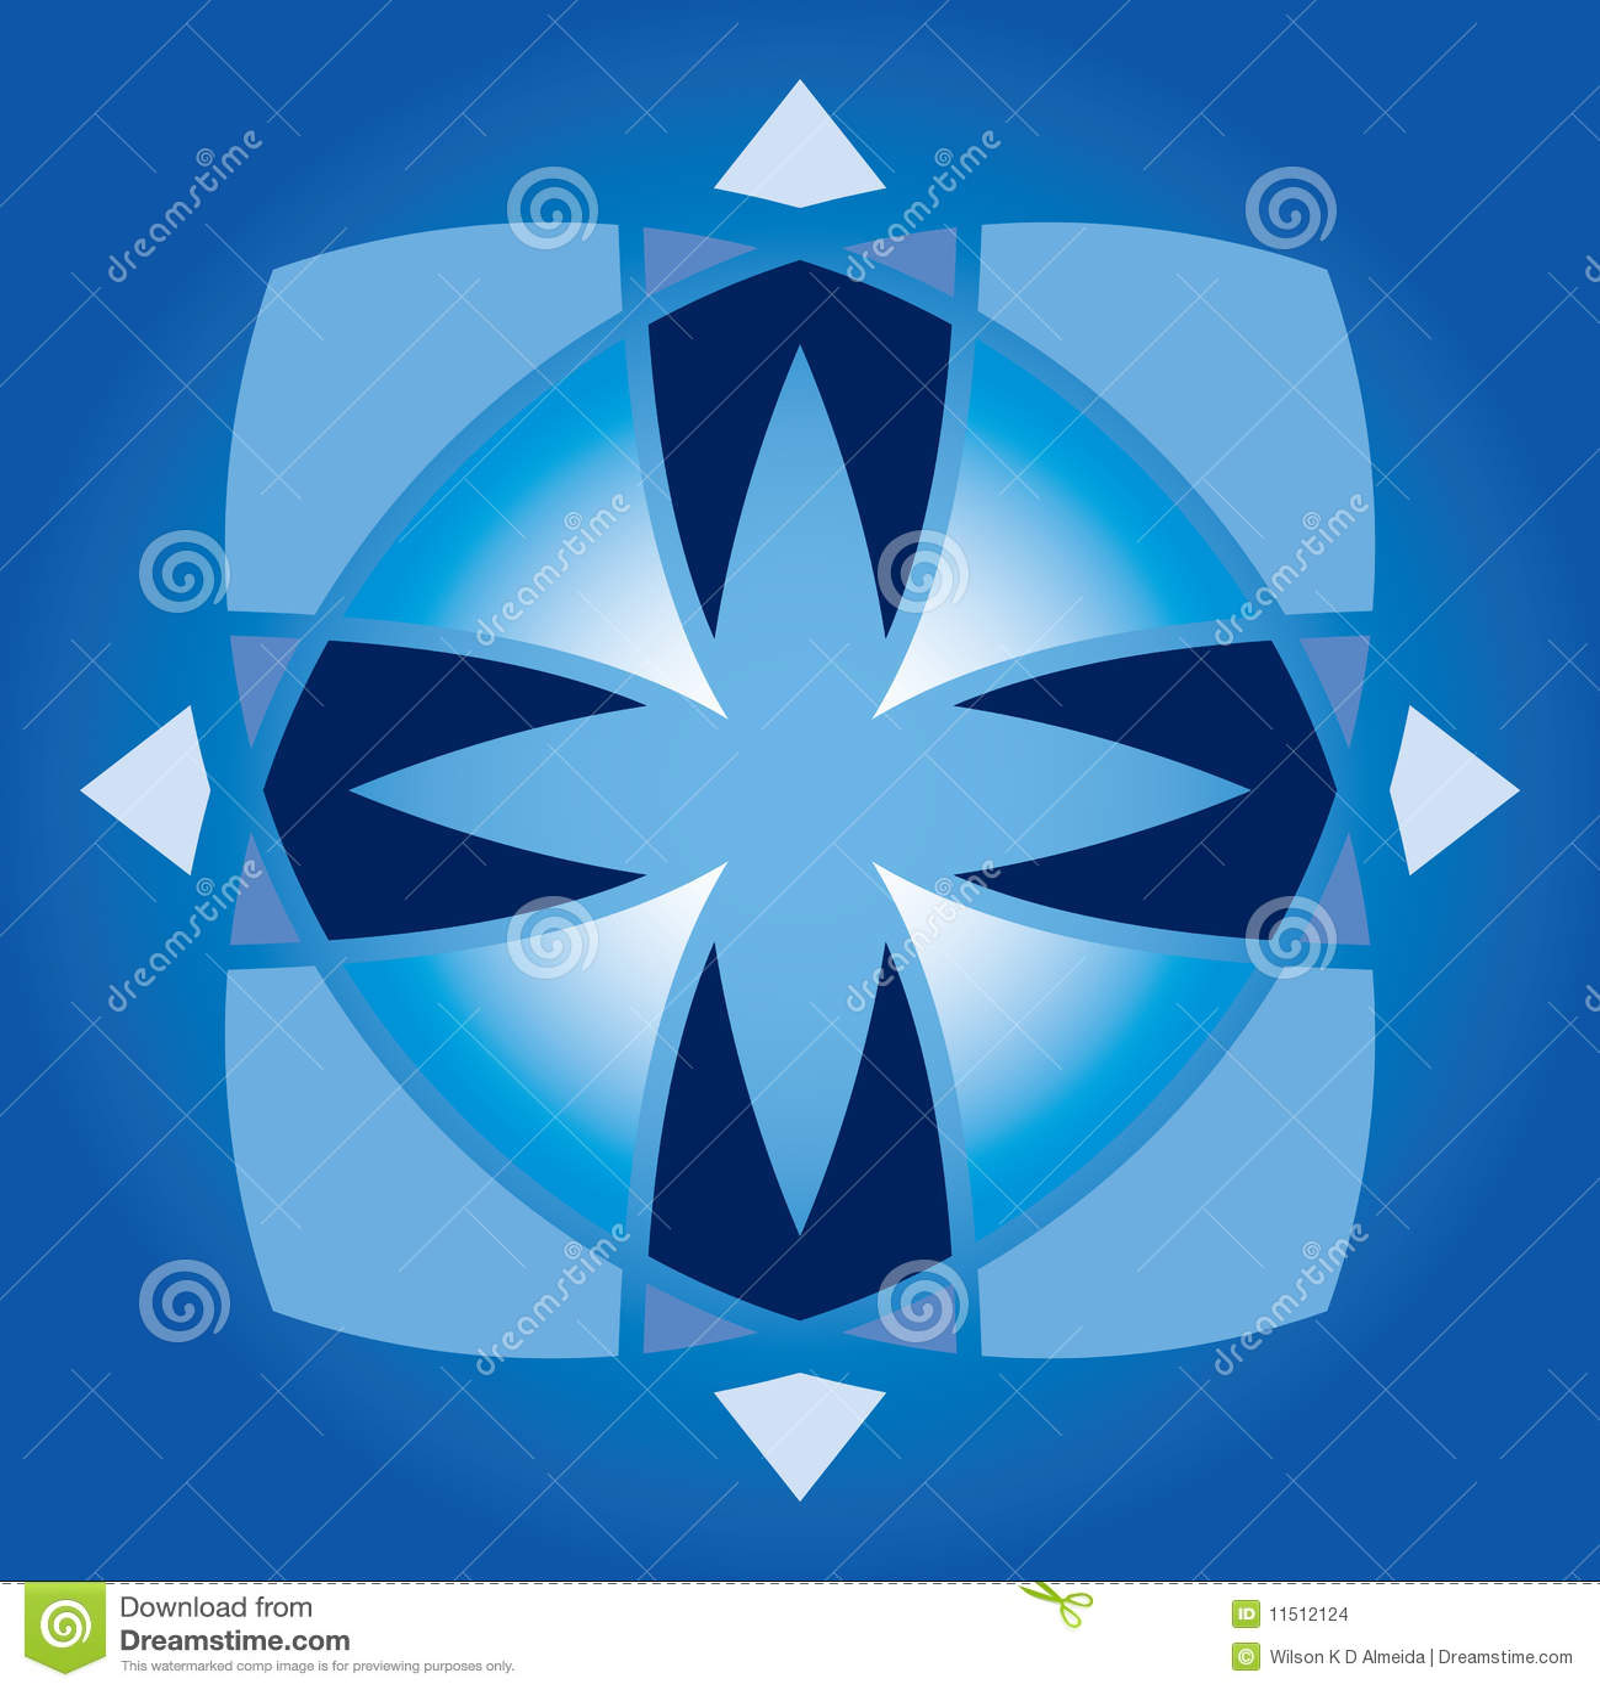 Oriental Design Motif Ornament